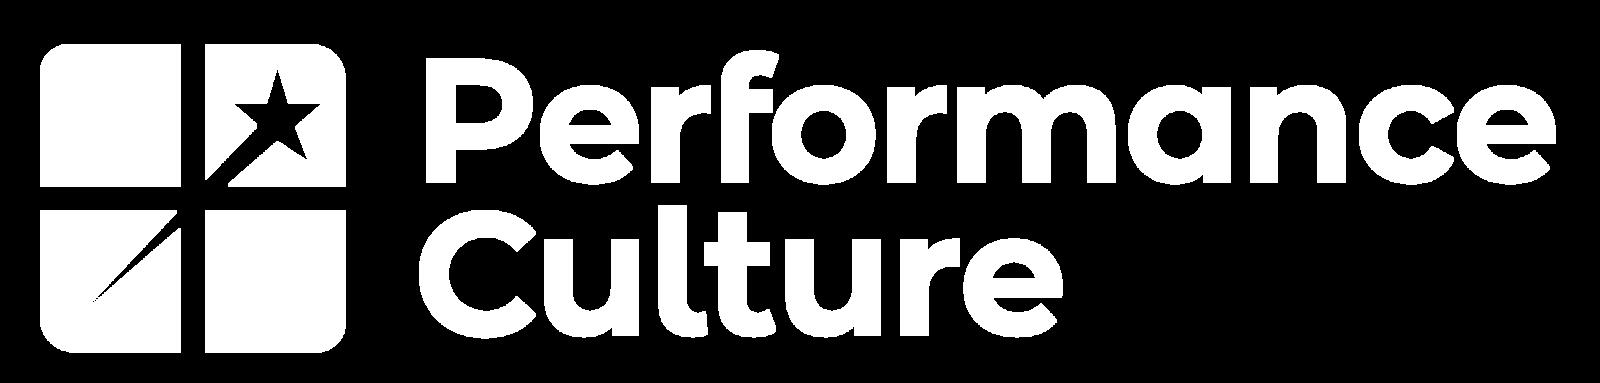 Performance Culture Help Desk